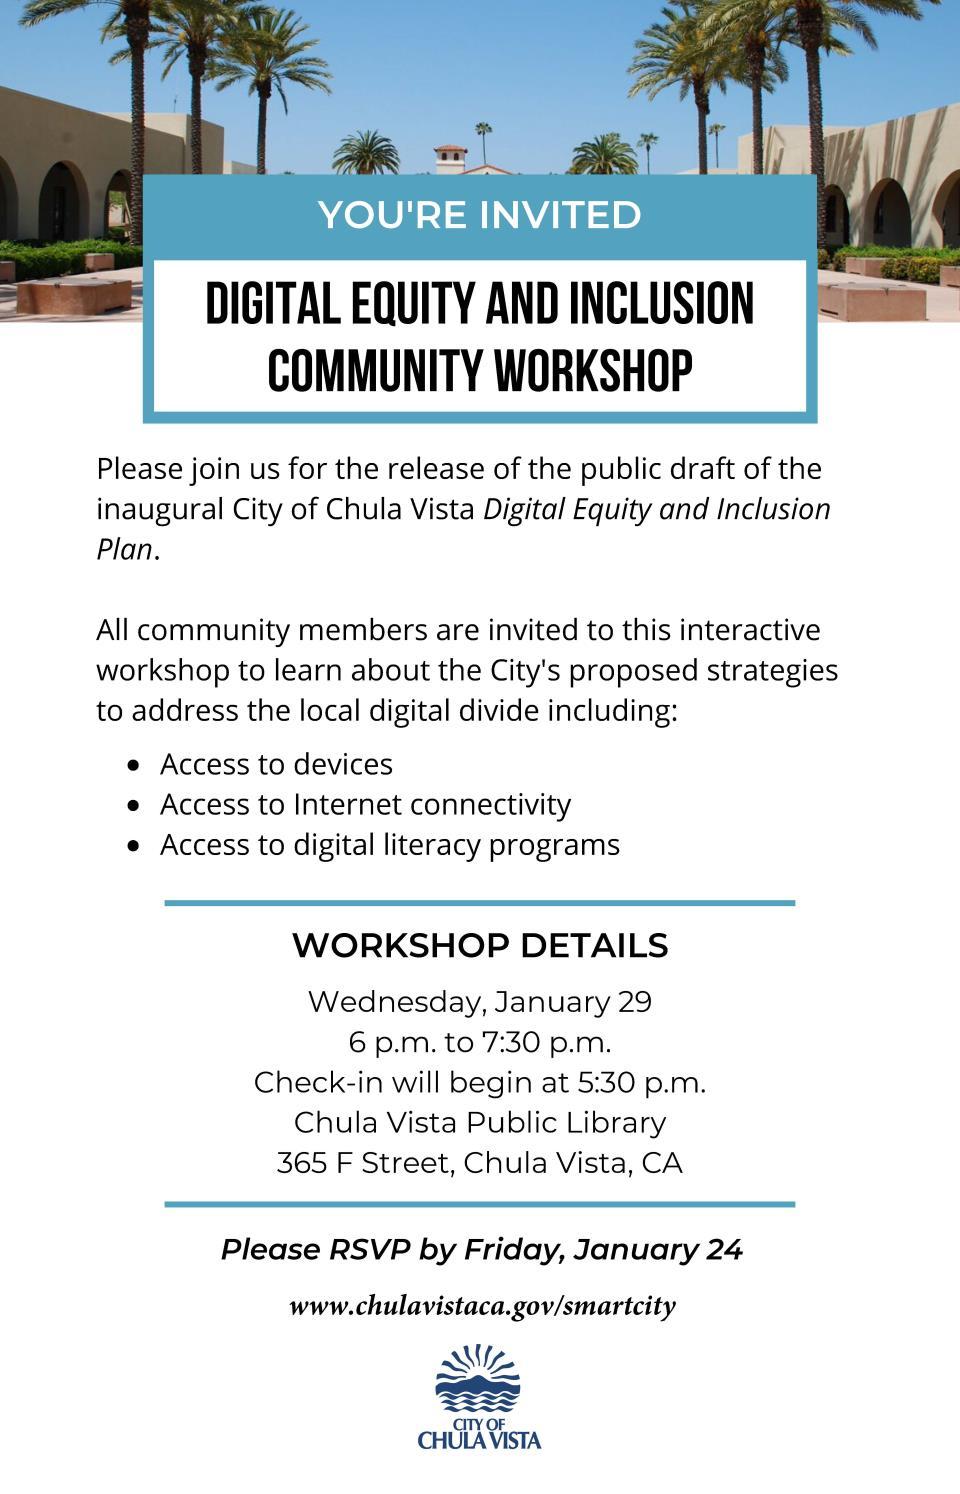 DEIP Community Workshop Invitation with RSVP link